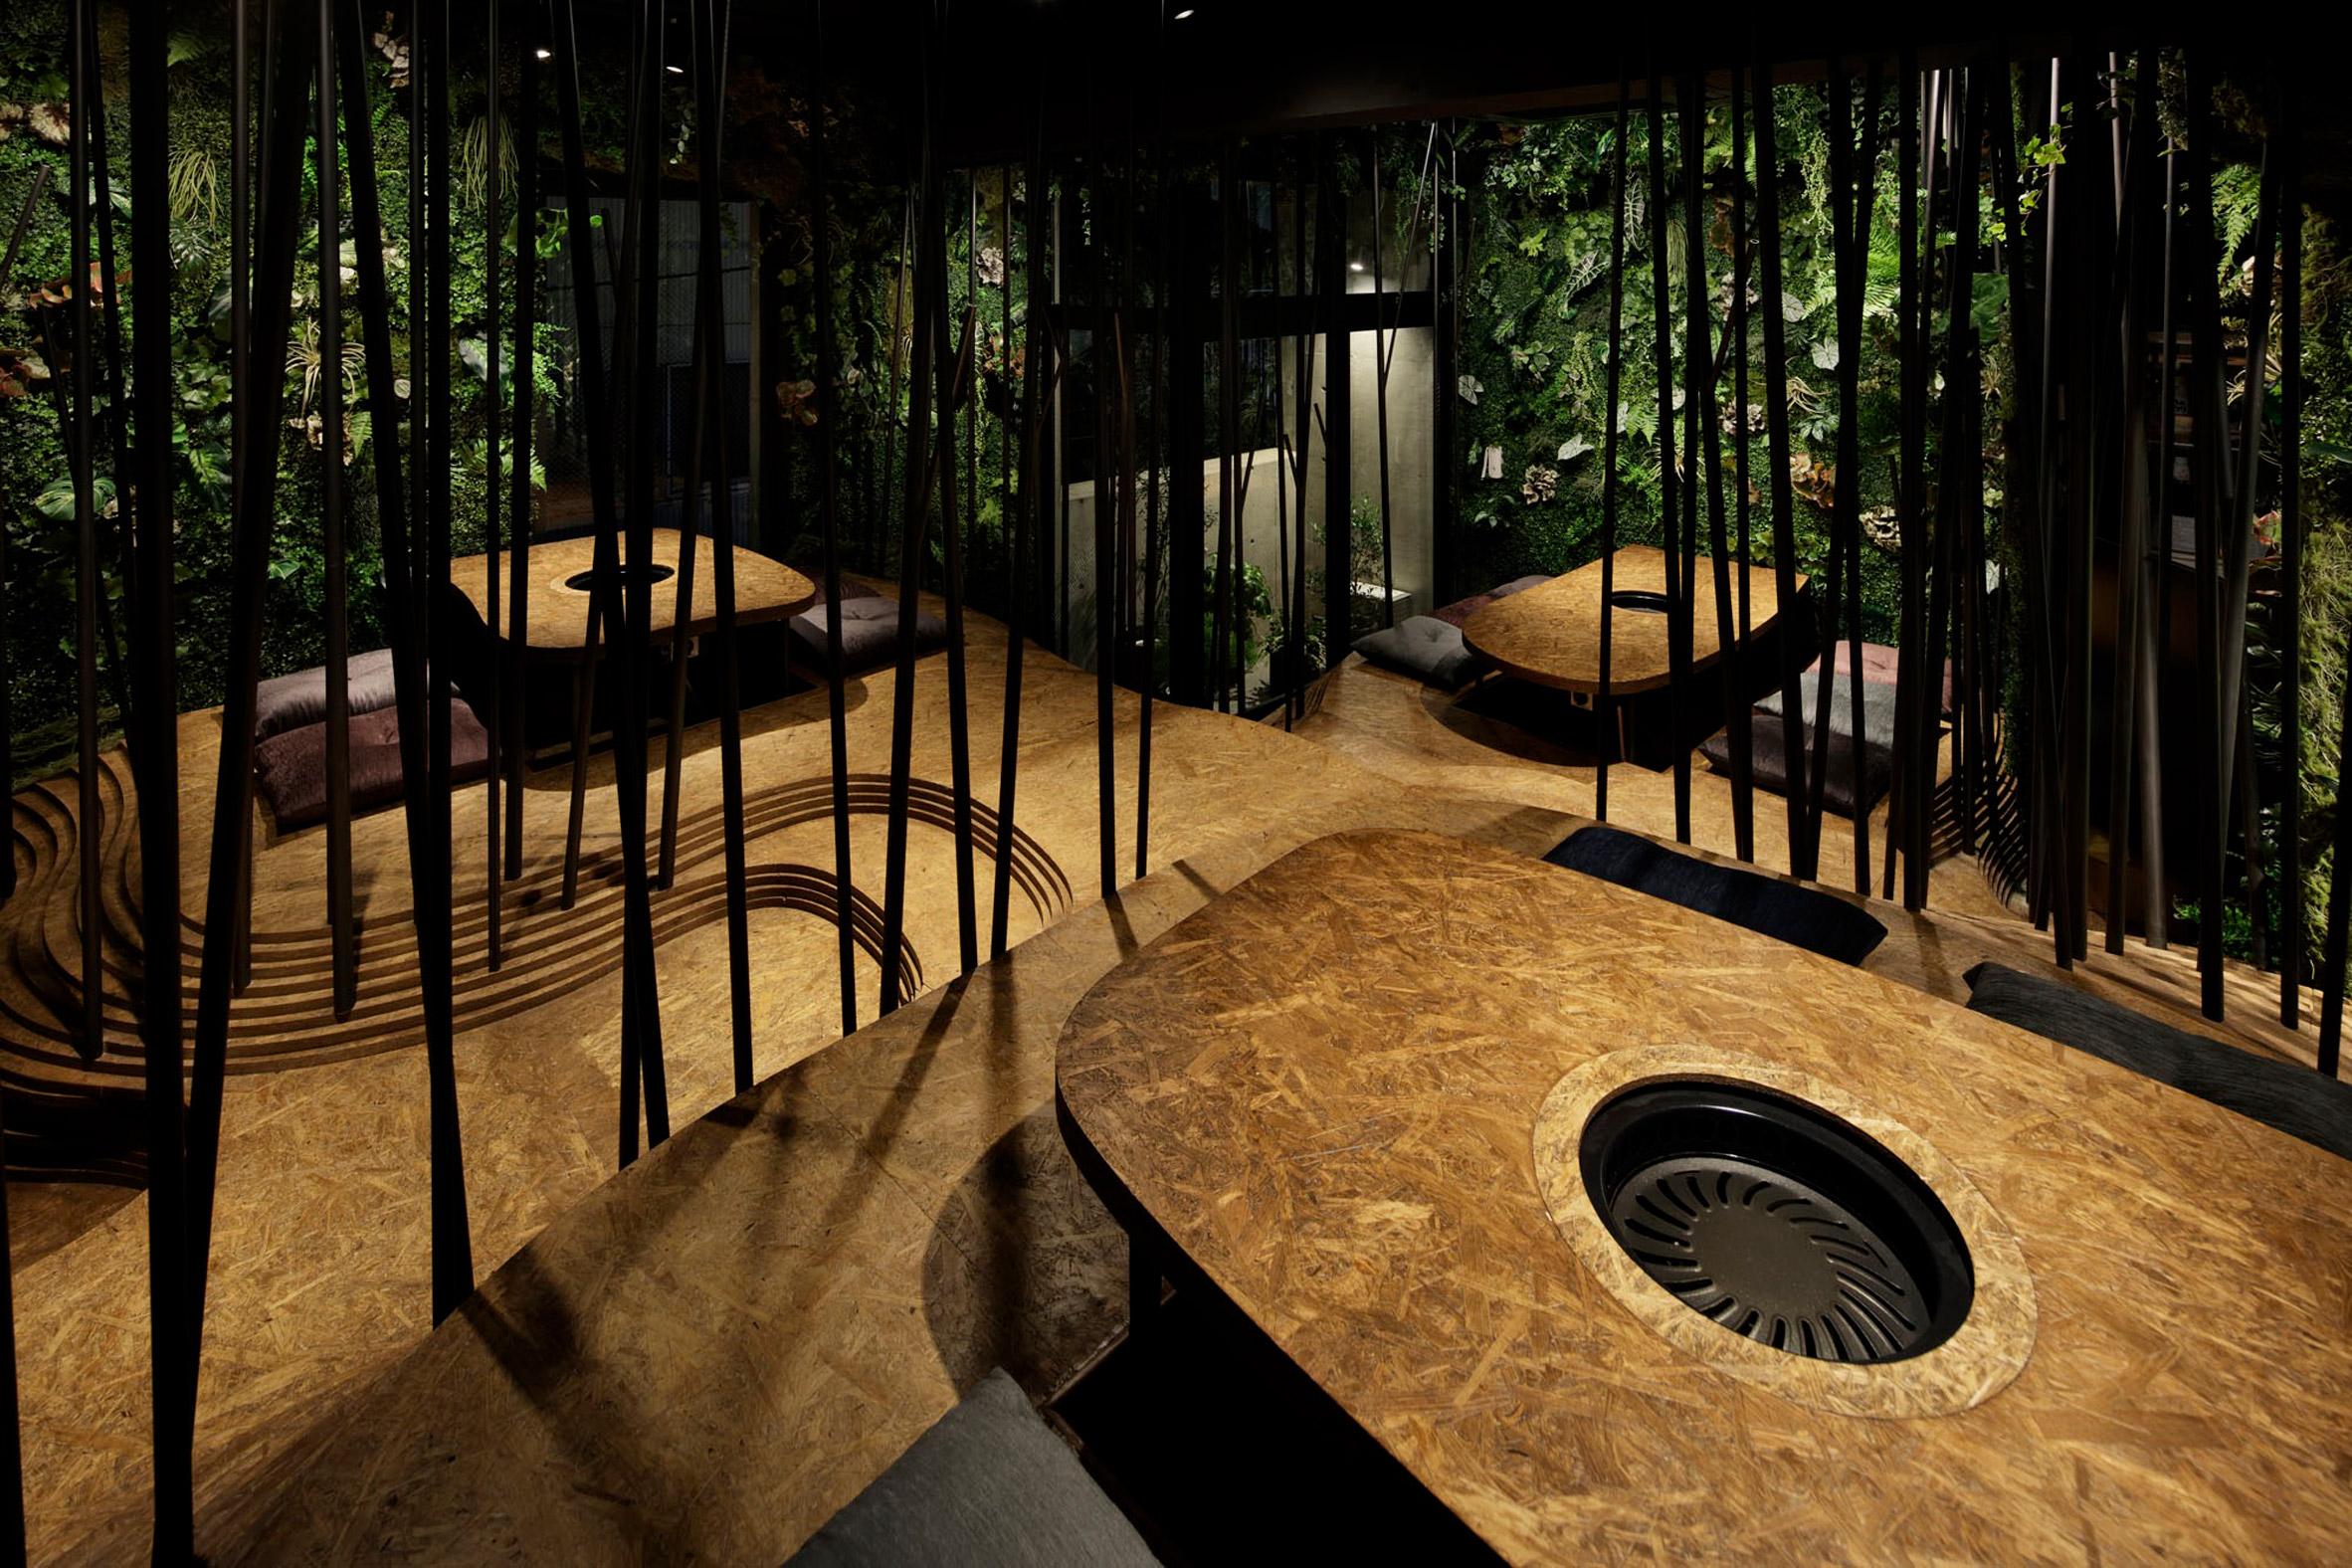 nikunotoriko-restaurant-interiors-tokyo-ryoji-Iedokoro-japan_dezeen_2364_col_15